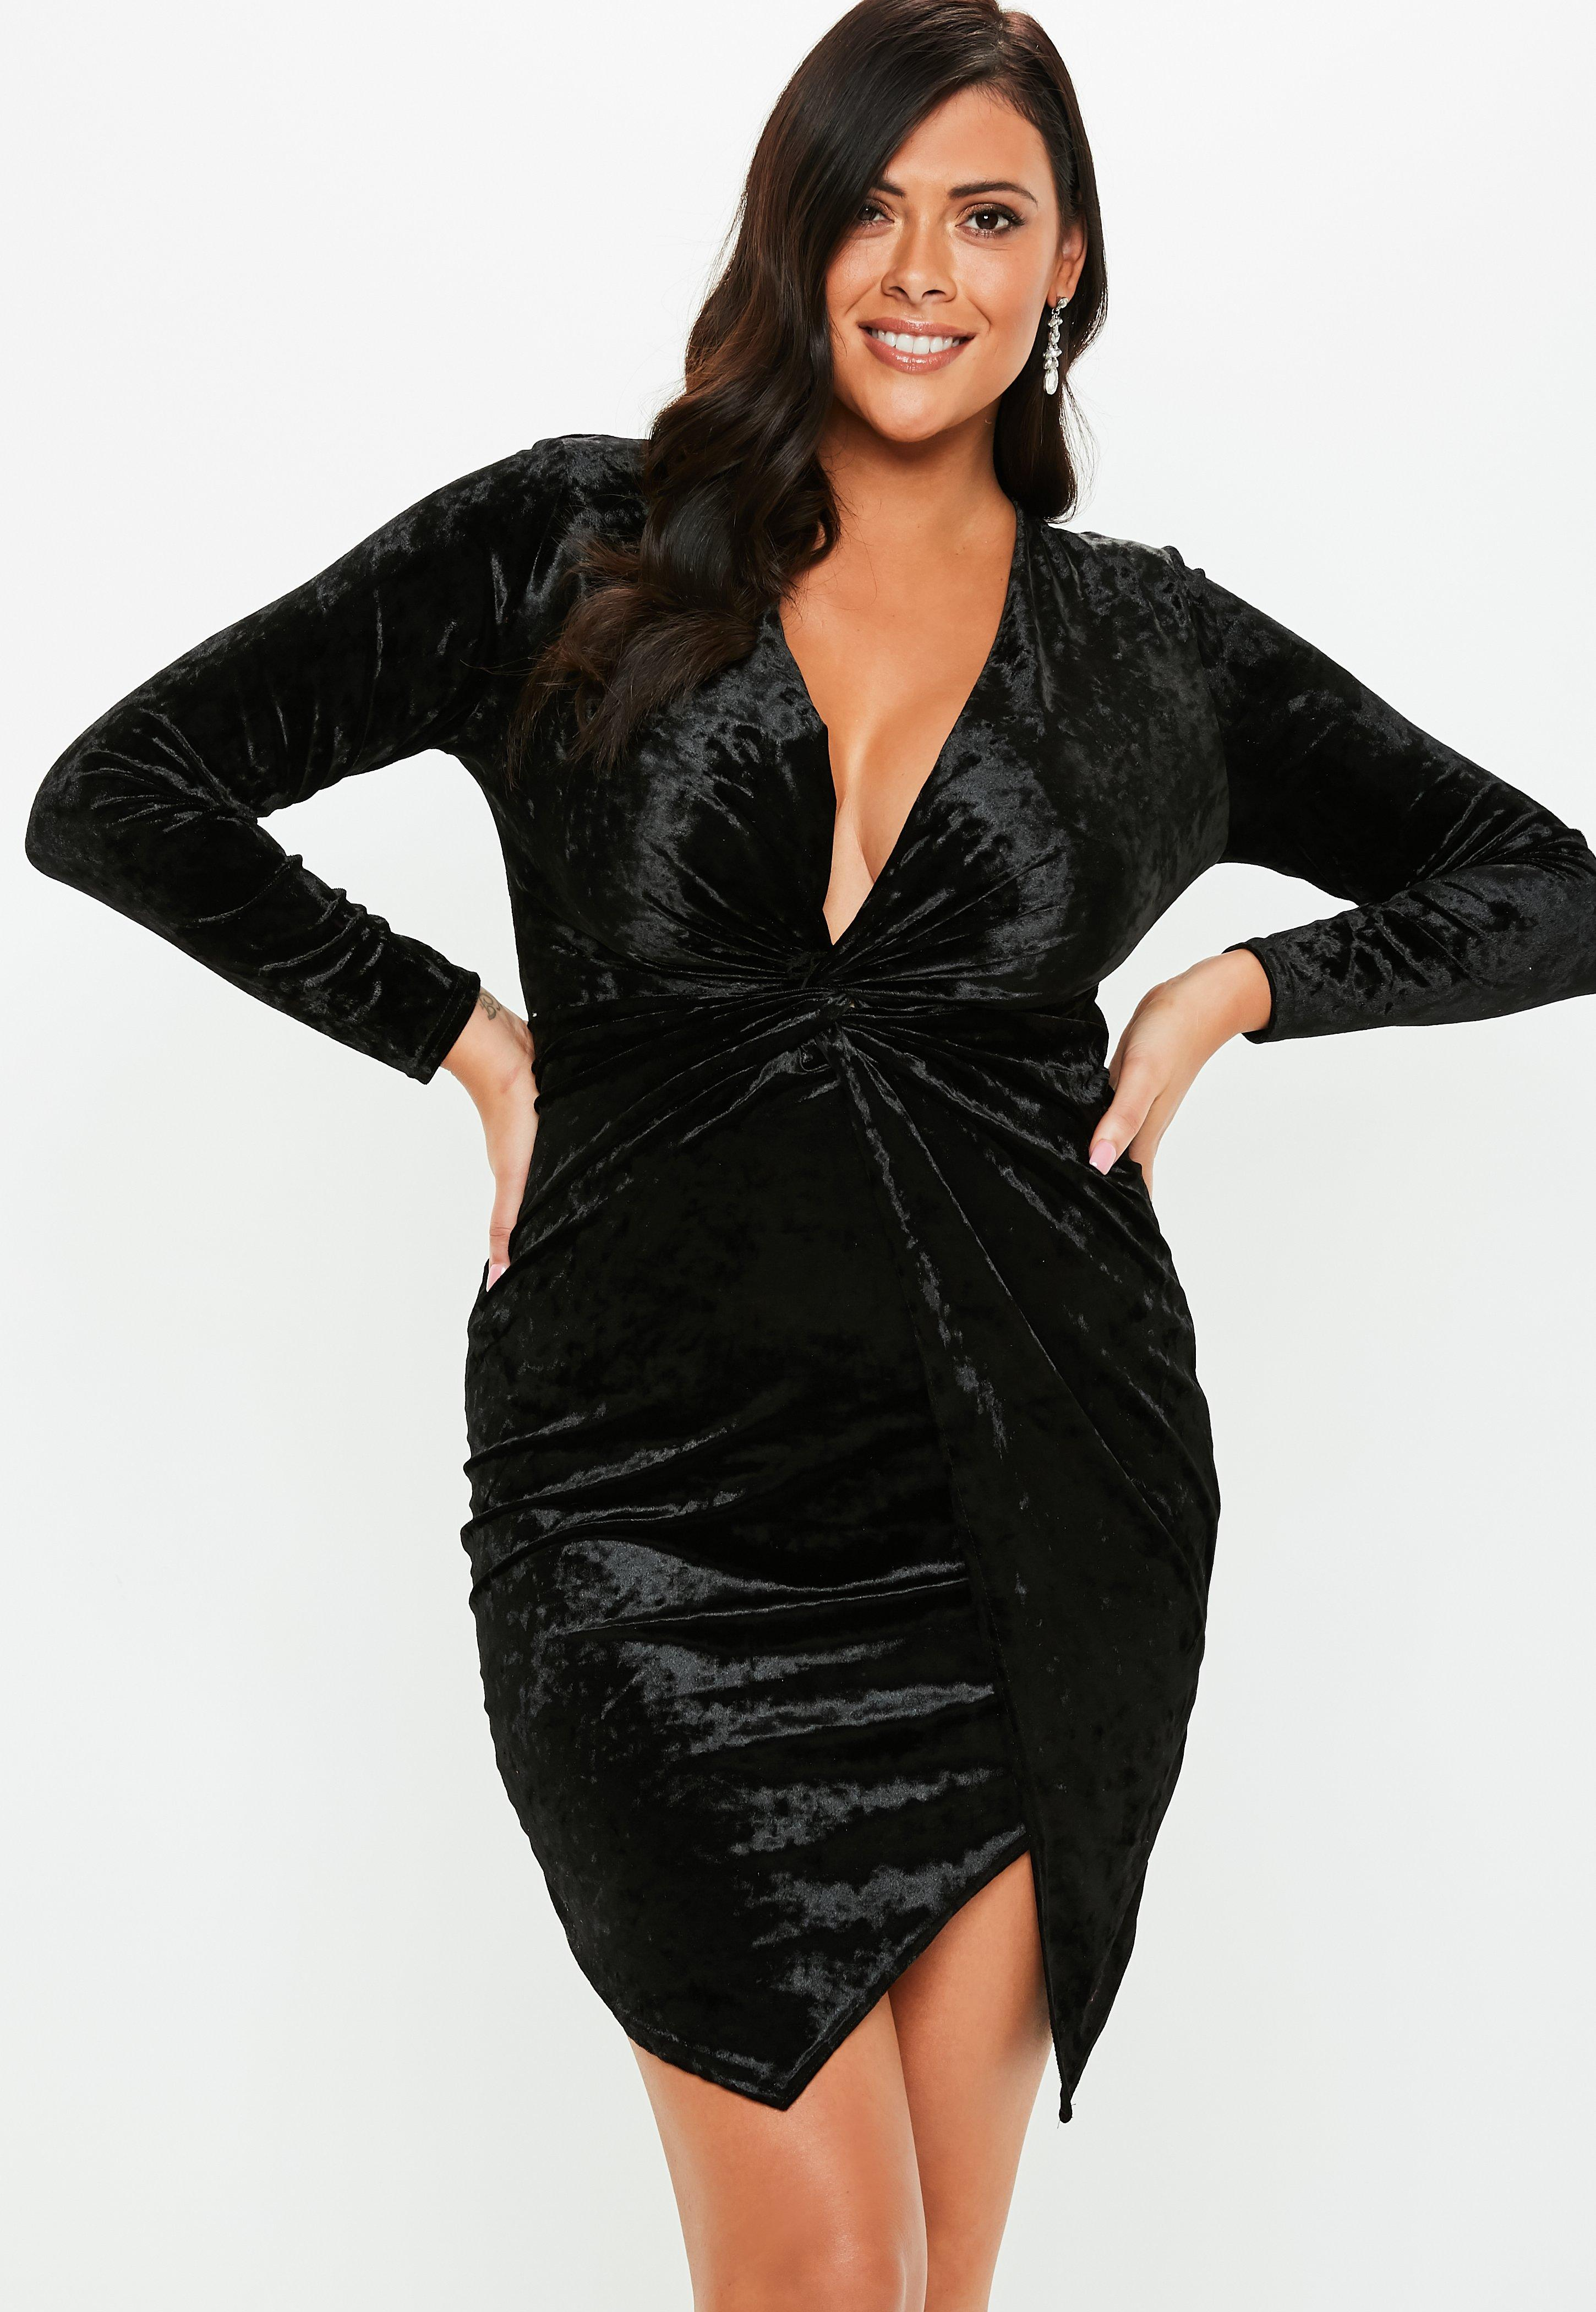 Mini Dresses Shop Short Missguided Timberland 14865xsbn 12 Coklat Rosegold